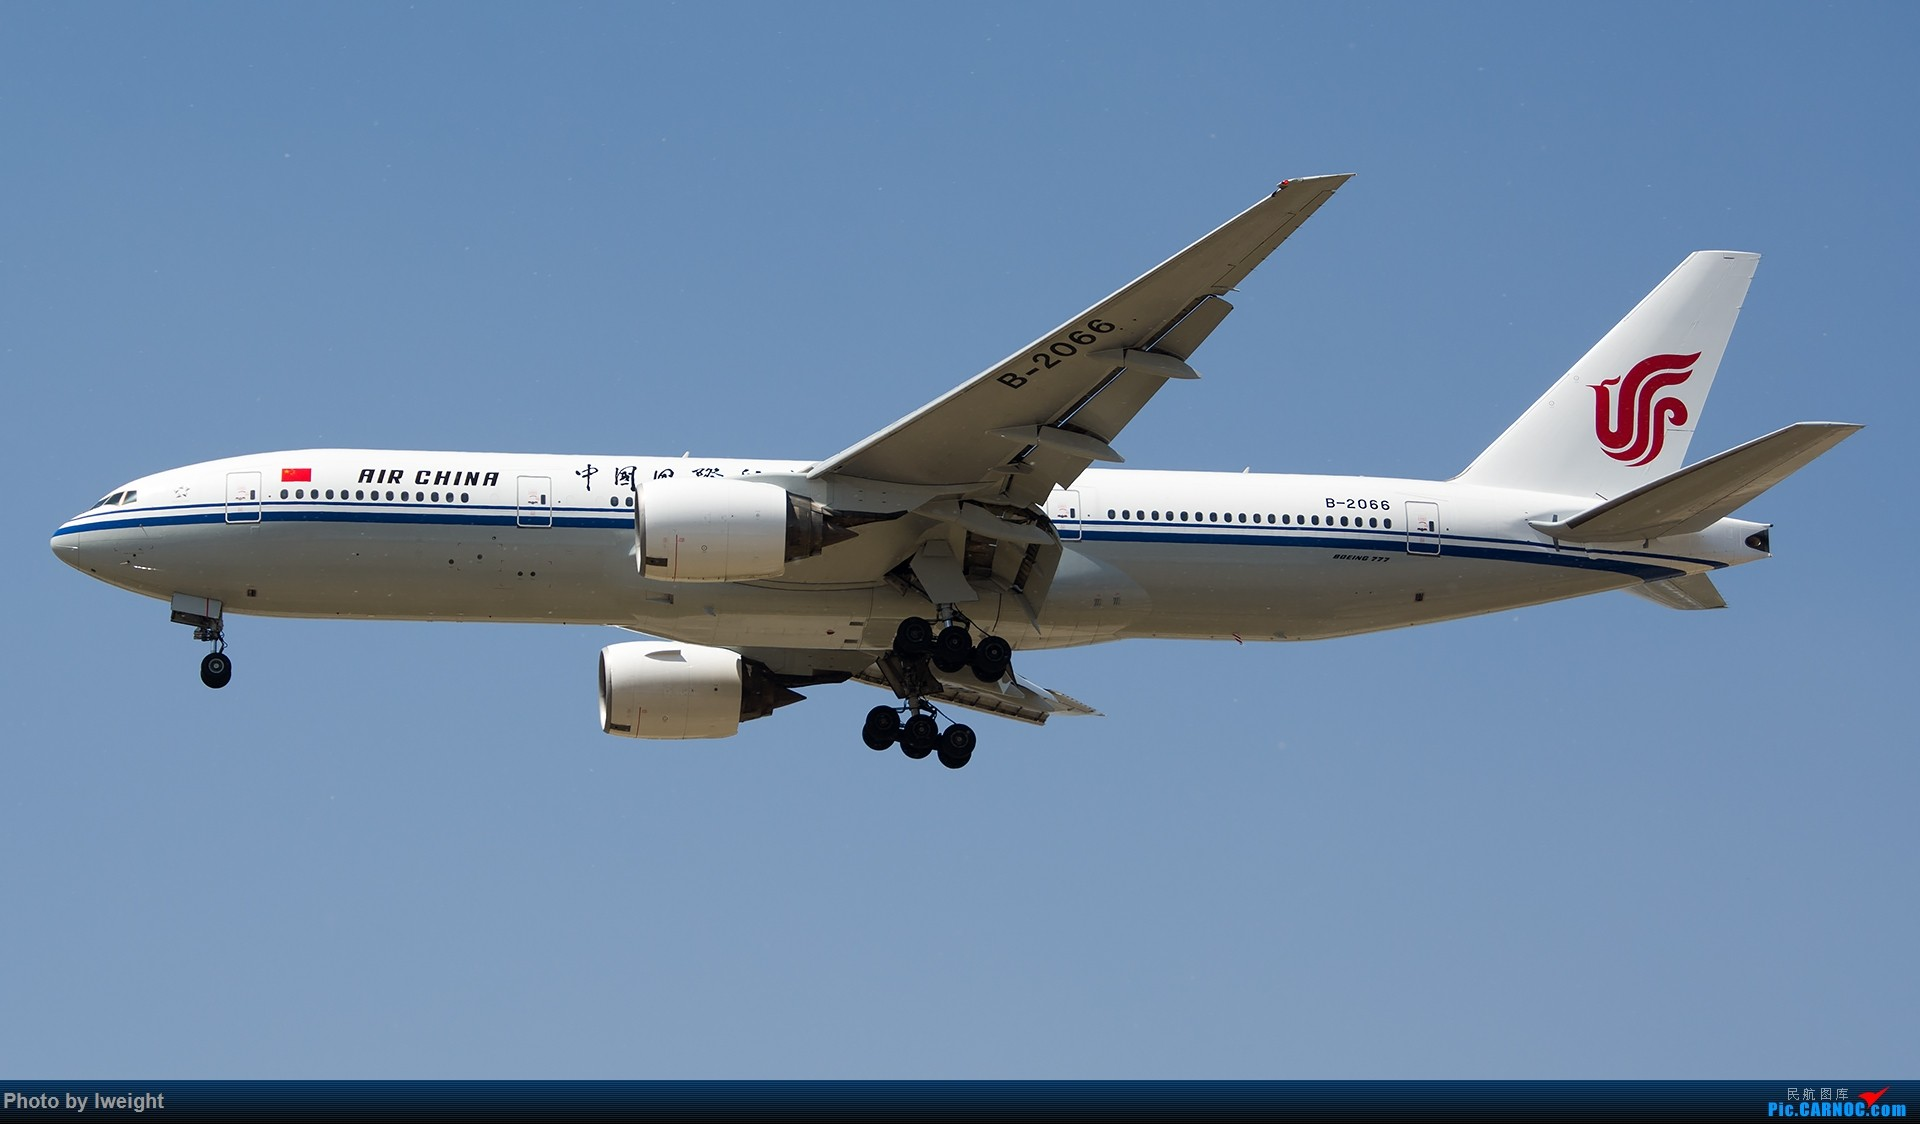 Re:[原创]2015年第一次在PEK拍北向南,其实是为Jimmy去的【2015-4-24】 BOEING 777-200 B-2066 中国北京首都国际机场